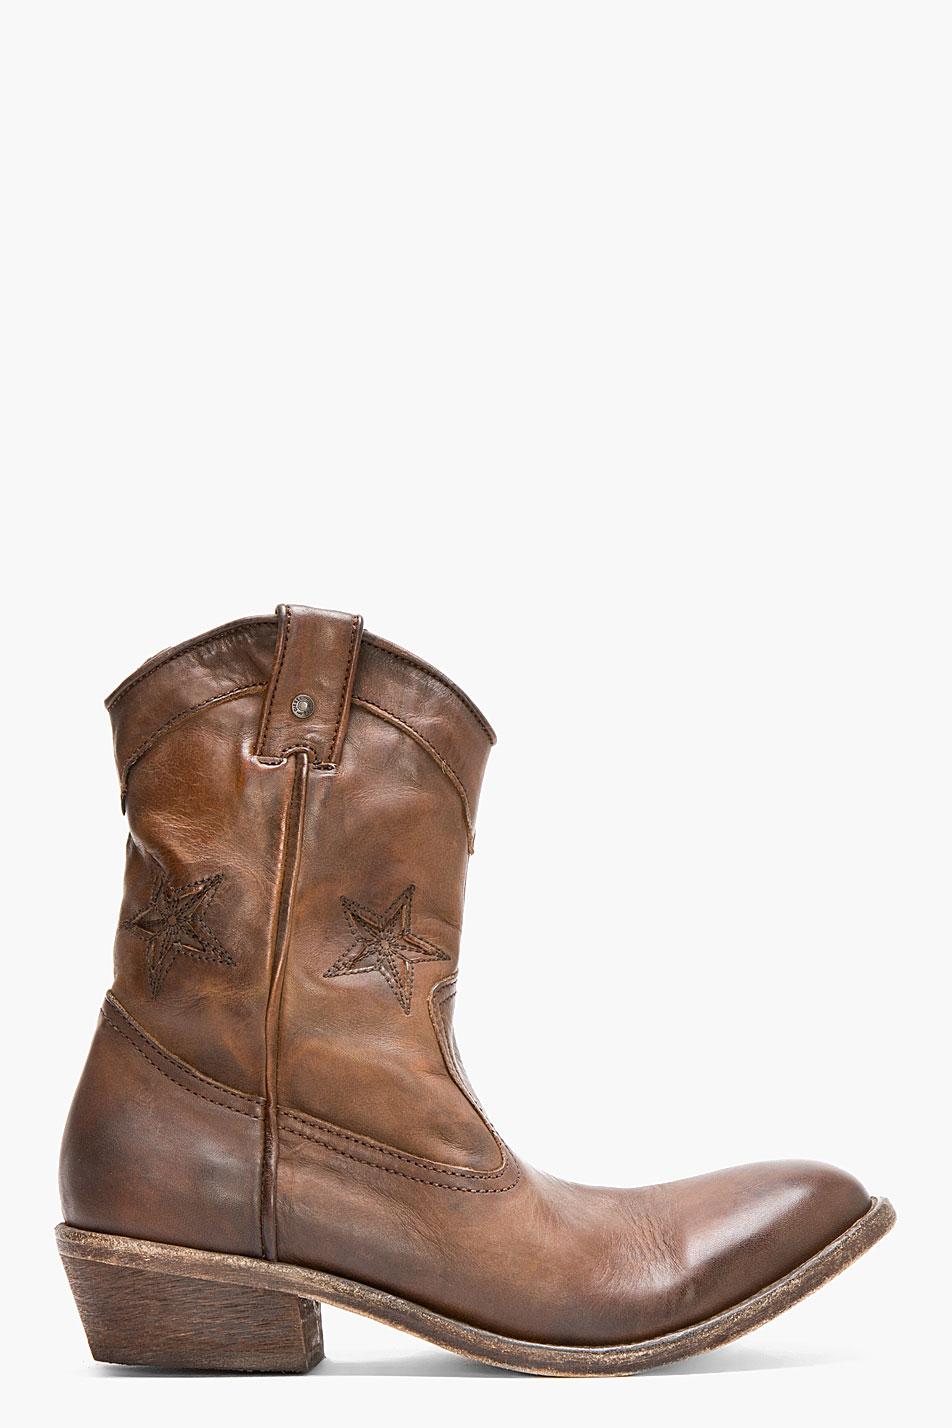 diesel brown leather korkero cowboy boots in brown for